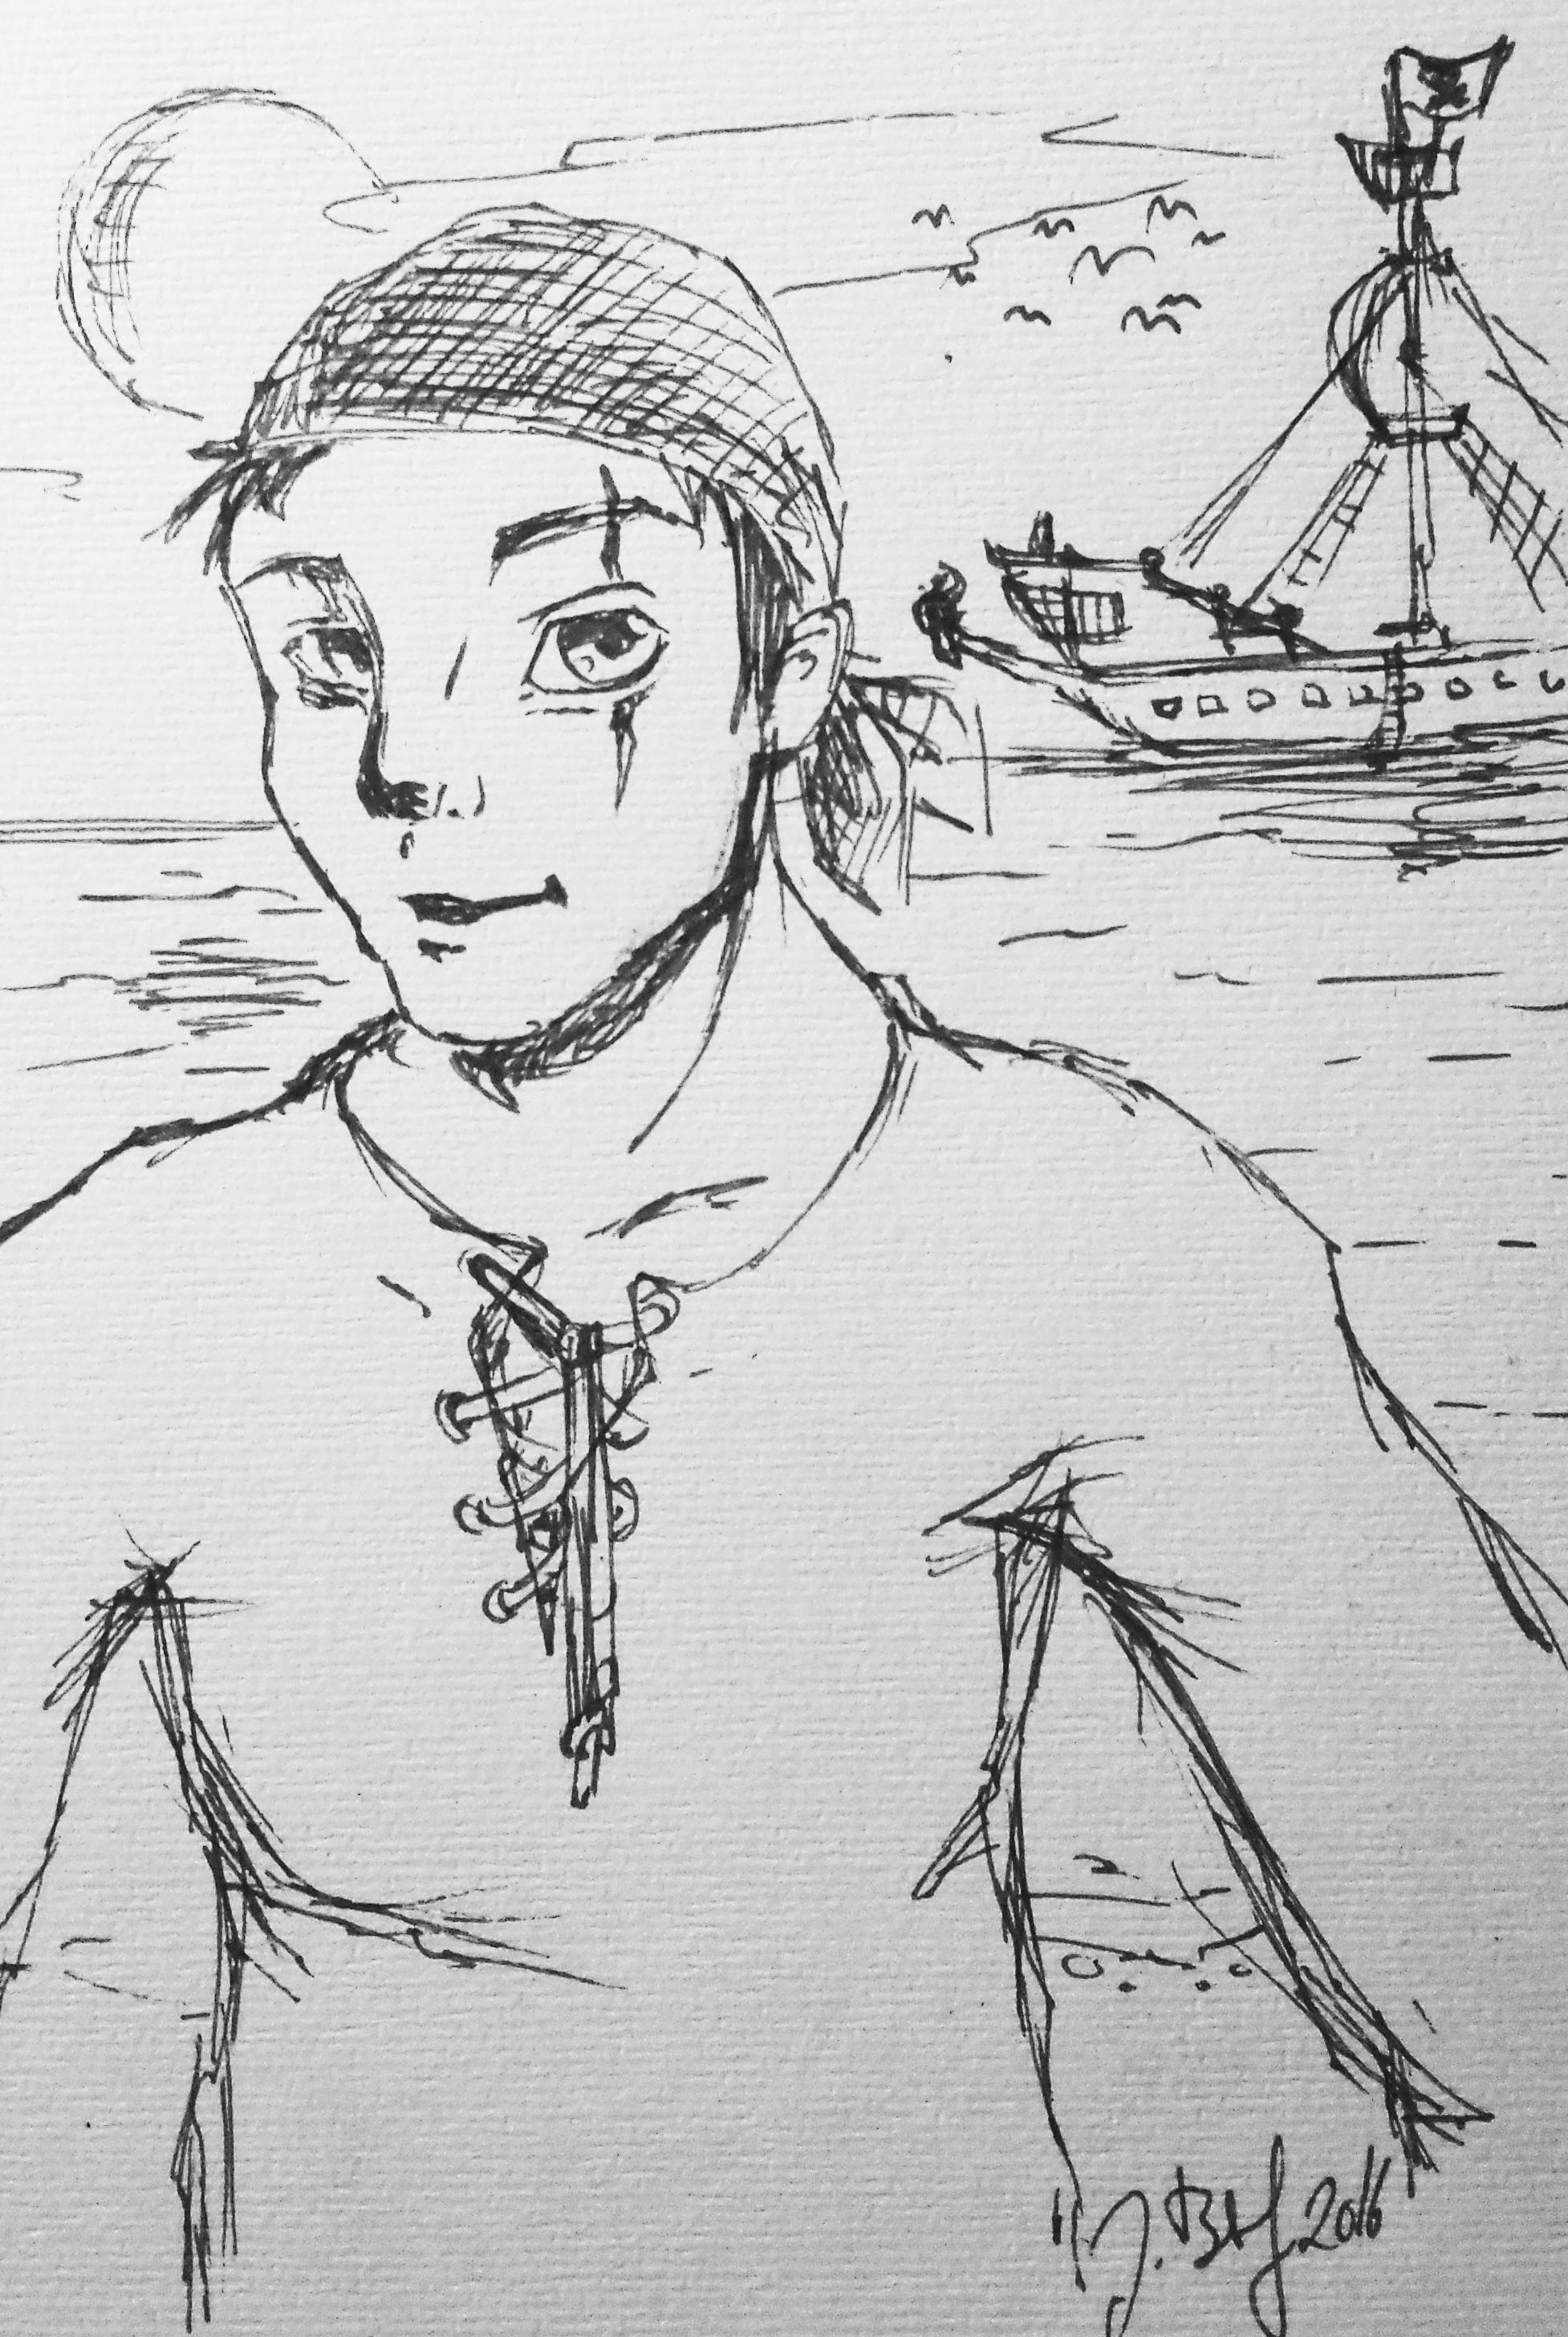 Pirat Sketch